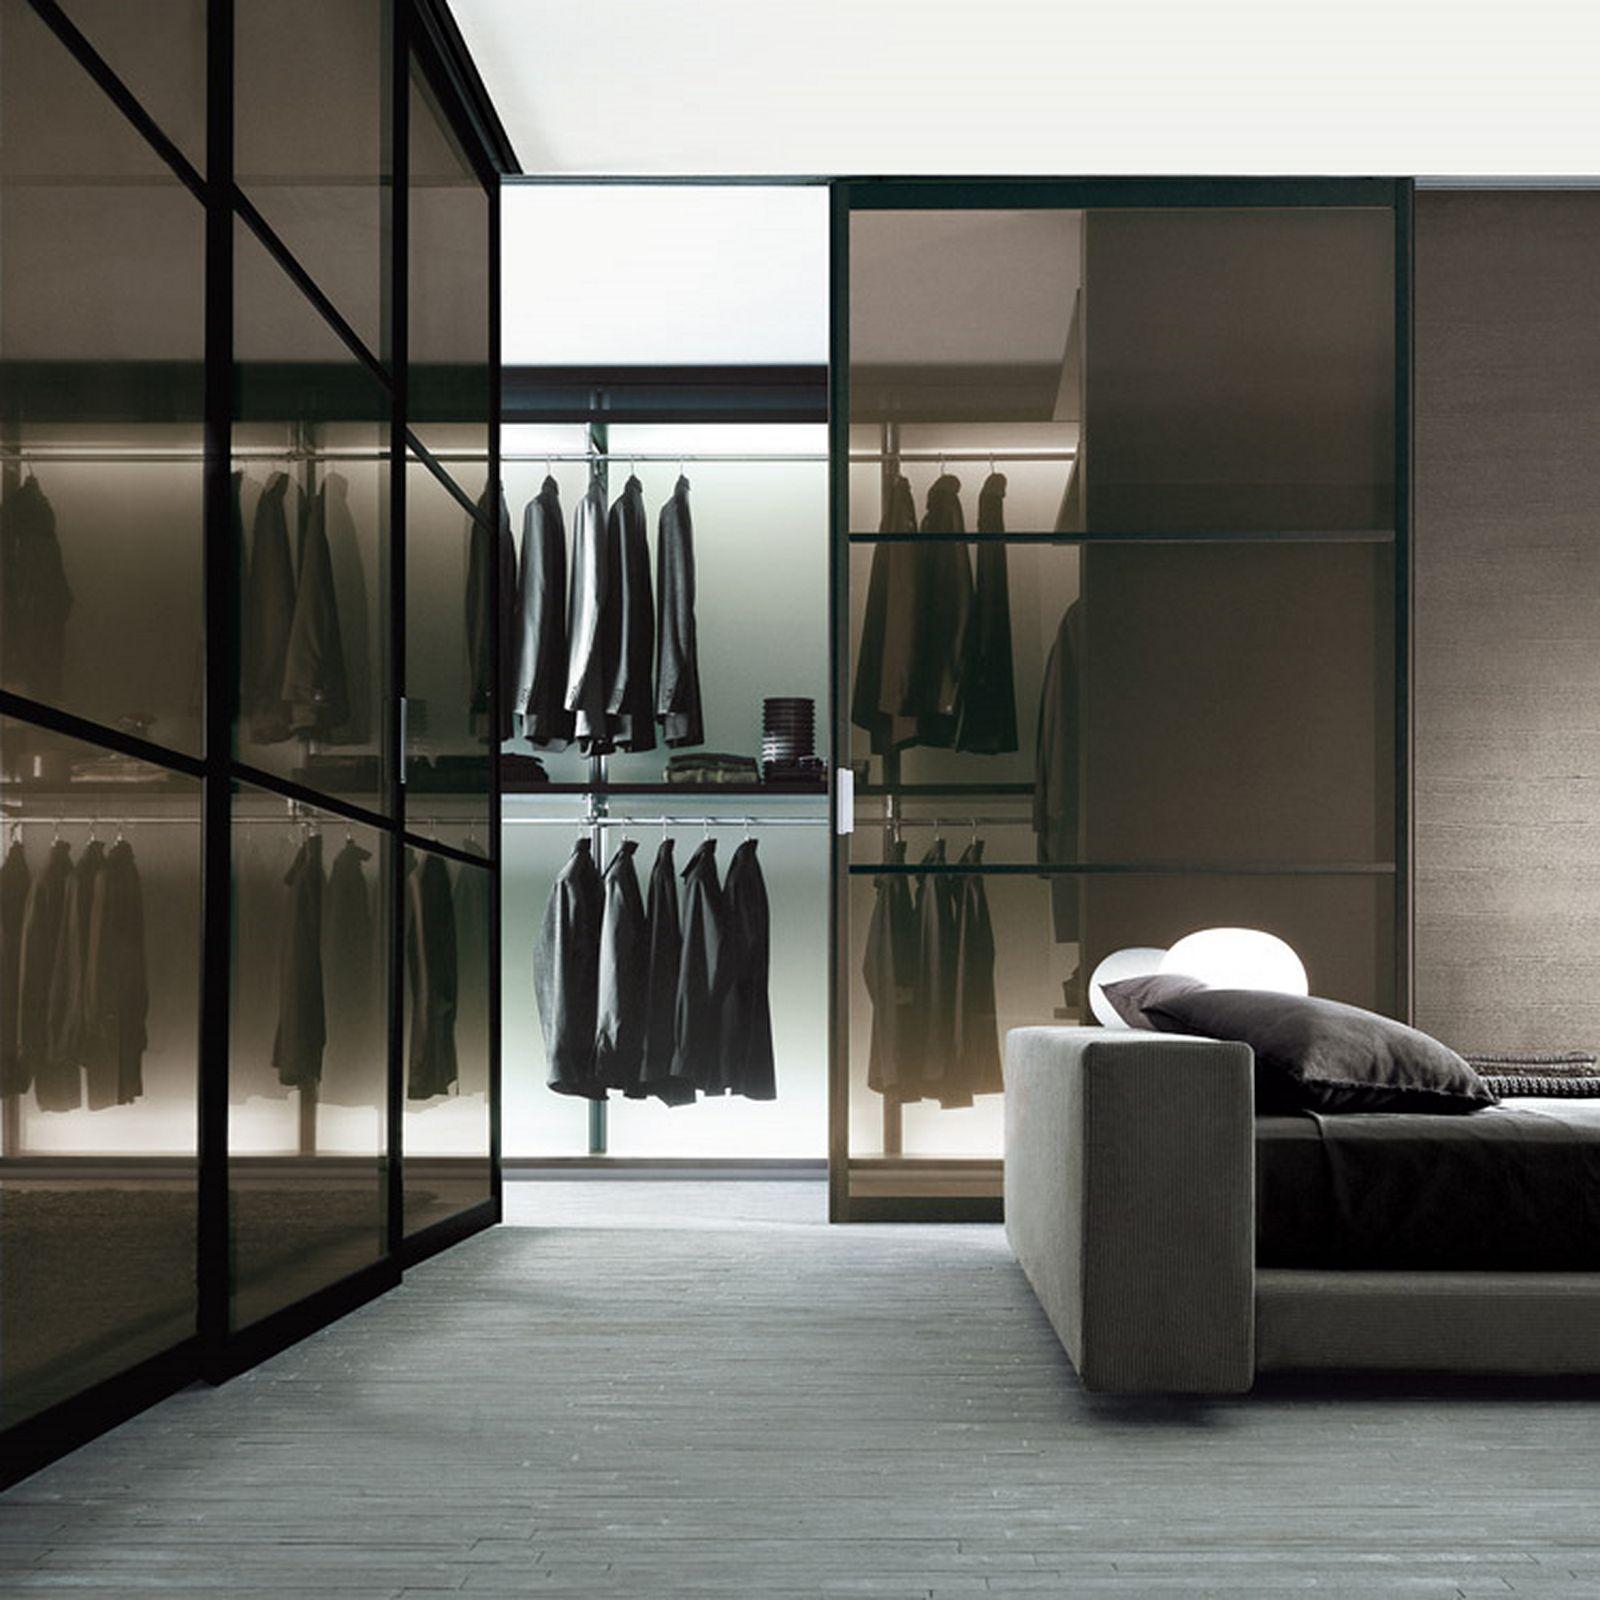 furniture-cool-modern-closet-and-wardrobes-design-ea-lisa-adams-closet-stunning-man-wardrobe-furniture-photo-walk-in-closet-design-elegant-wardrobe-closet